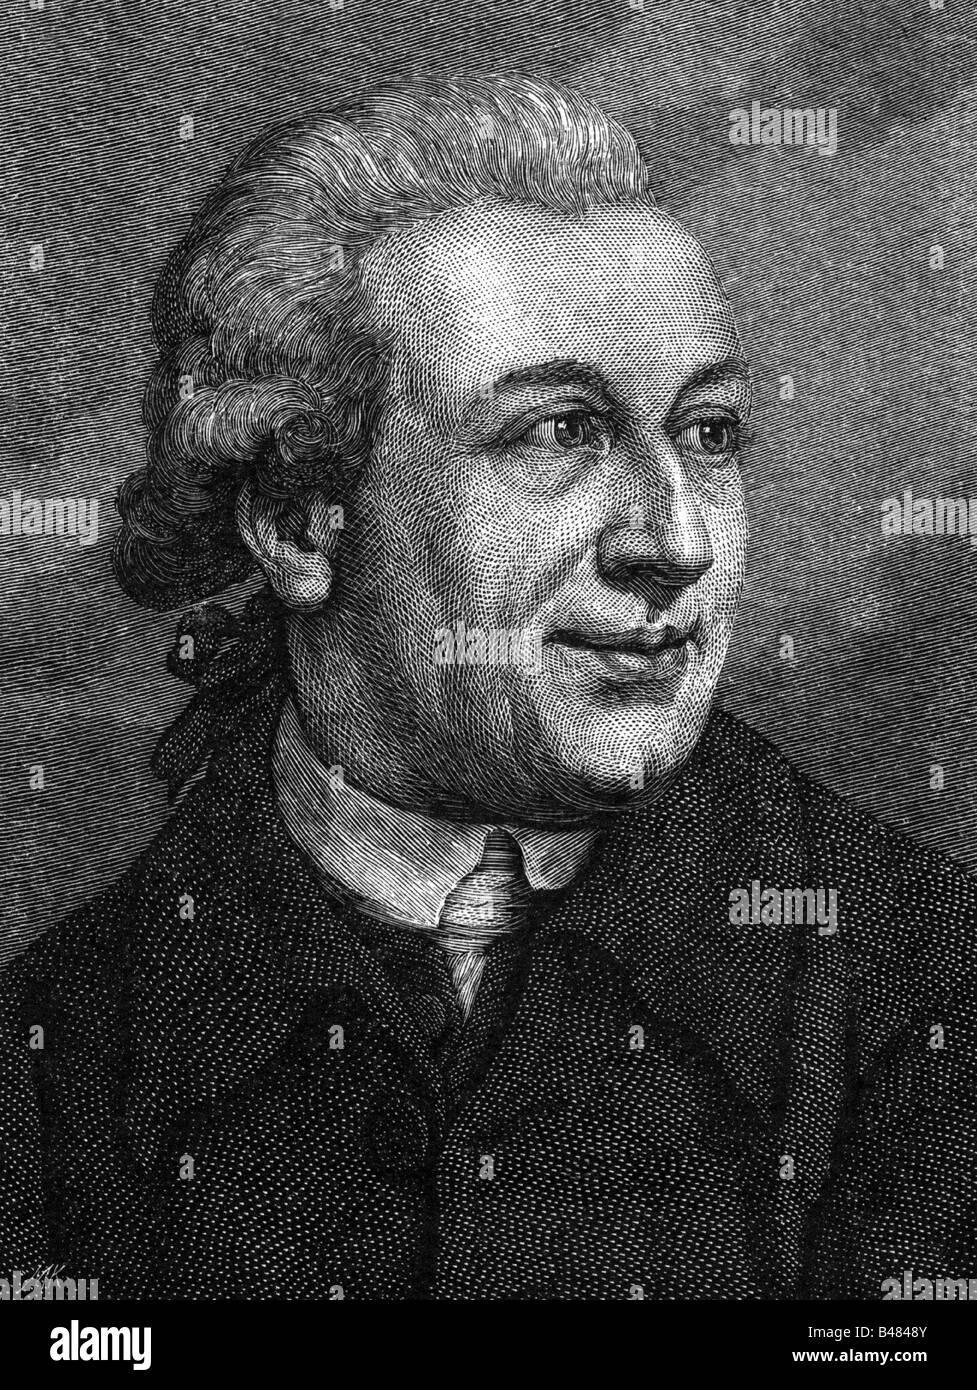 Forster, Johann Reinhold, 22.10.1729 - 9.12.1798, German naturalist, portrait, wood engraving, 19th century, , Additional - Stock Image